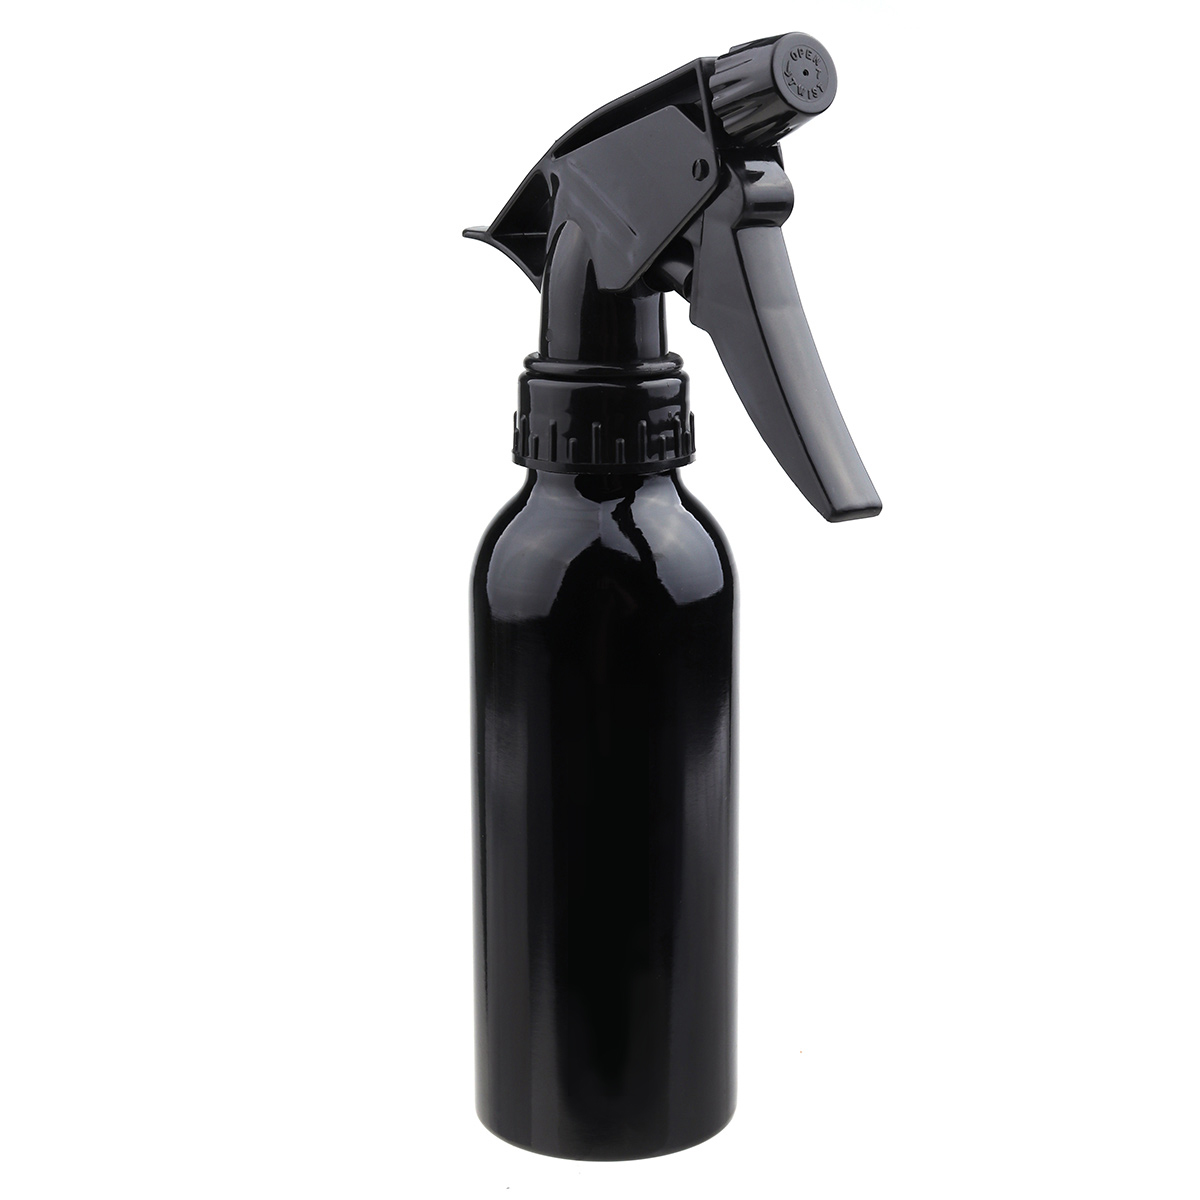 1pc 30 50 100 120 150 250ml Aluminum Bottle Mice Spray Fine Good Hair 200ml Refill Black Matte Salon Bottles Barber Cutting Atomizer Empty Water Sprayer Hairstyling Hairdressing